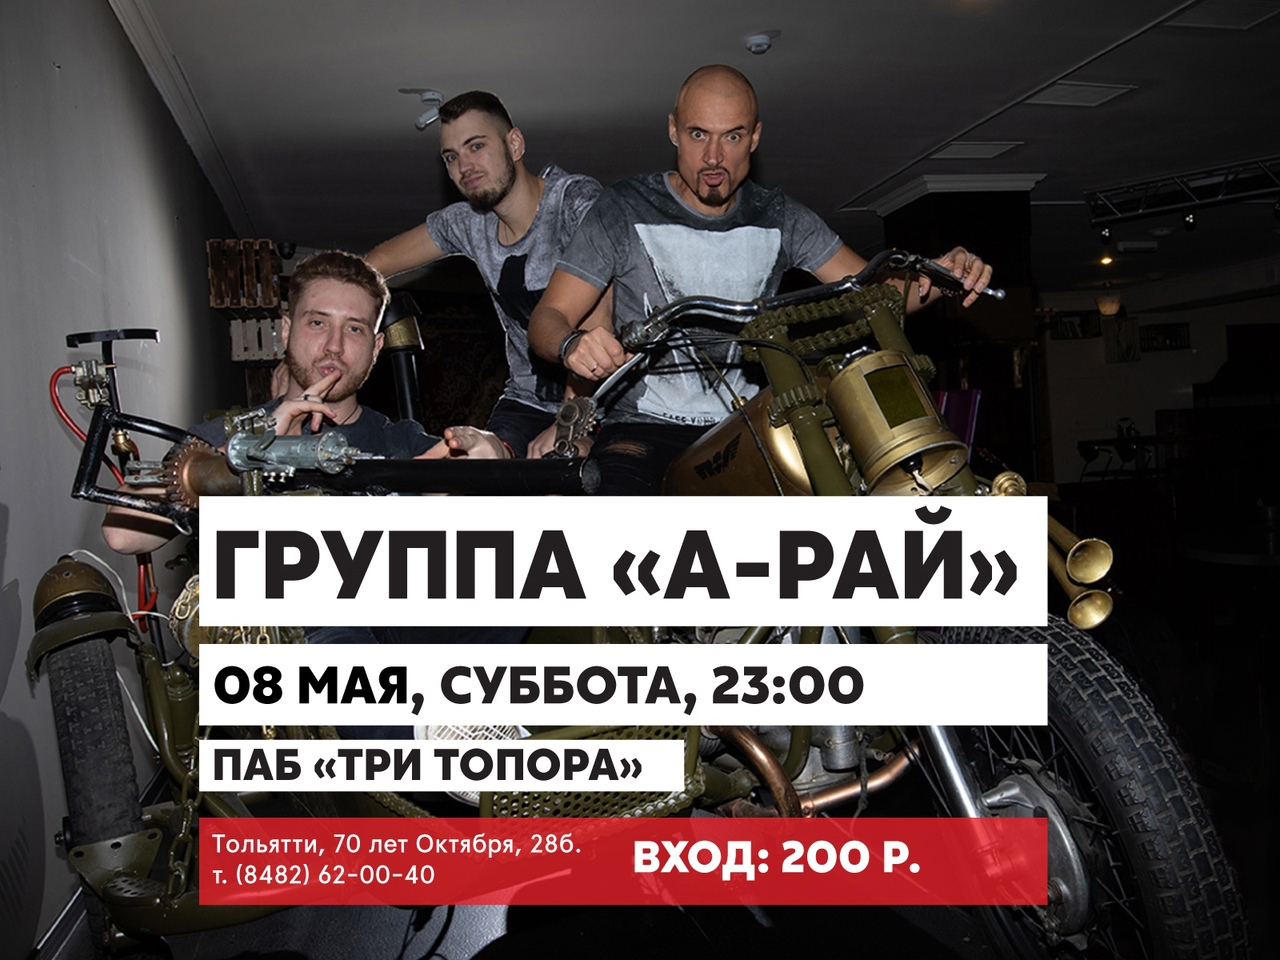 Афиша А-РАЙ в Топорах 8 мая 2021